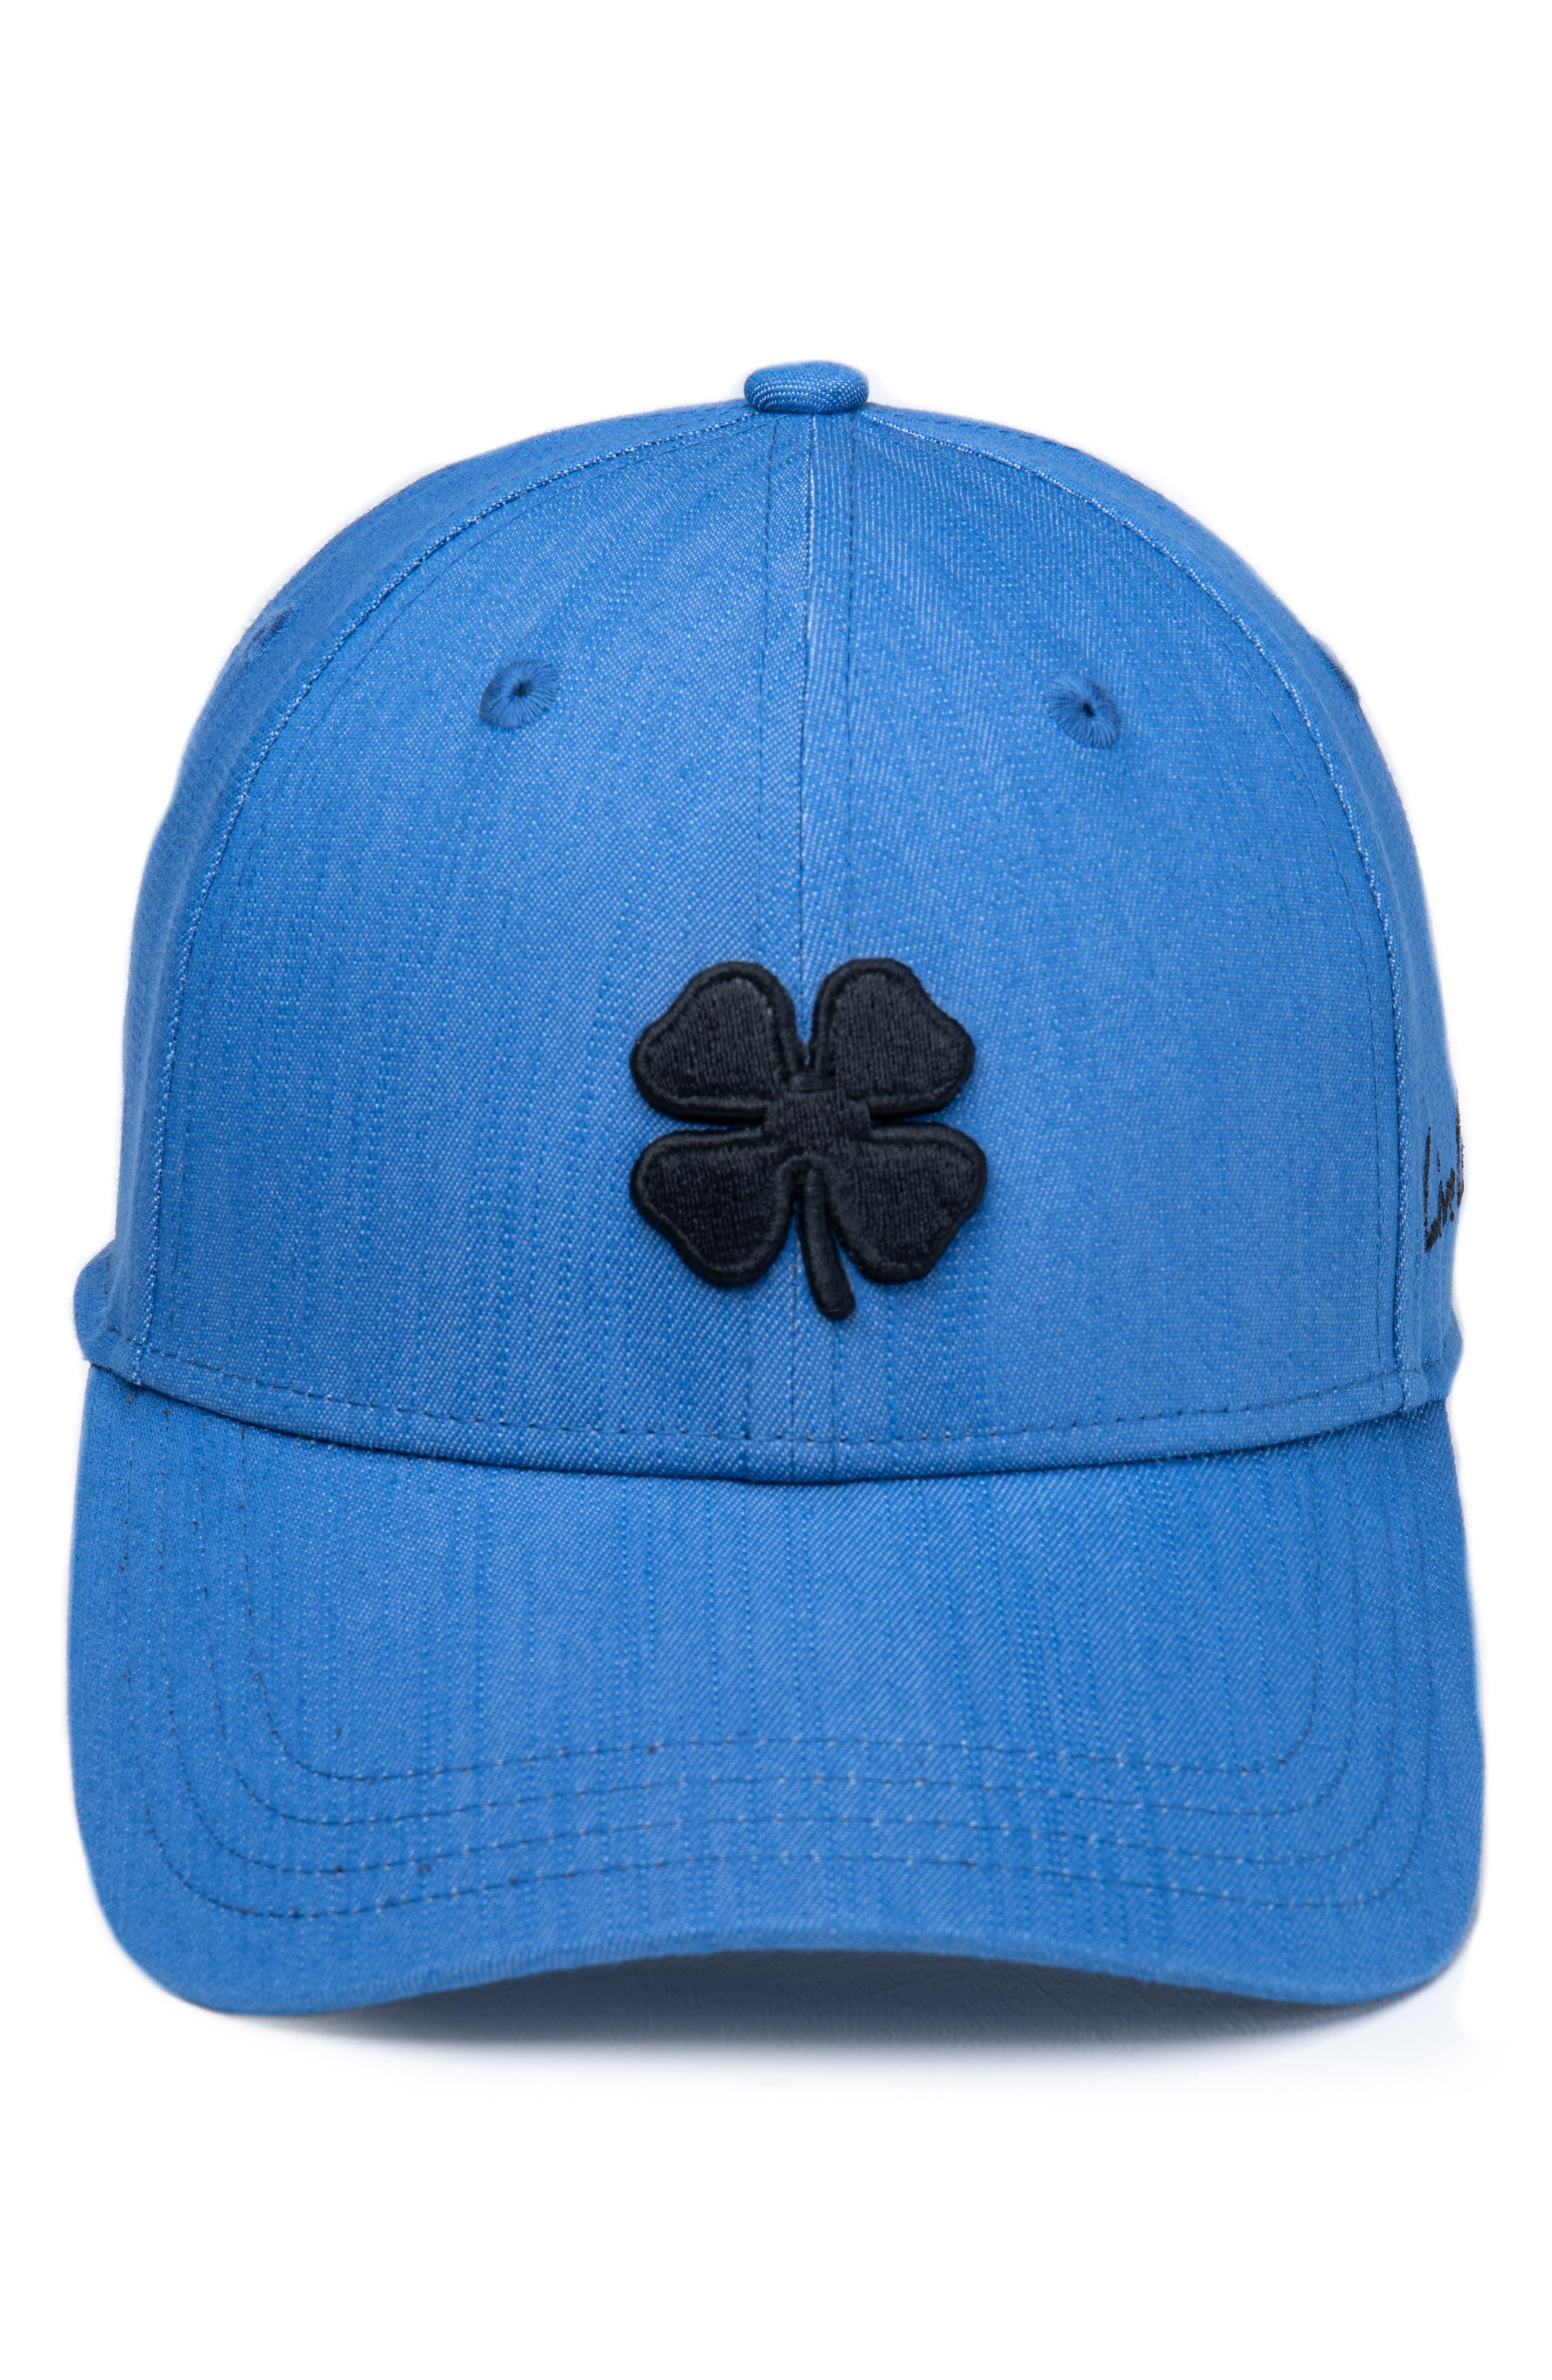 Classic Luck 3 Baseball Cap